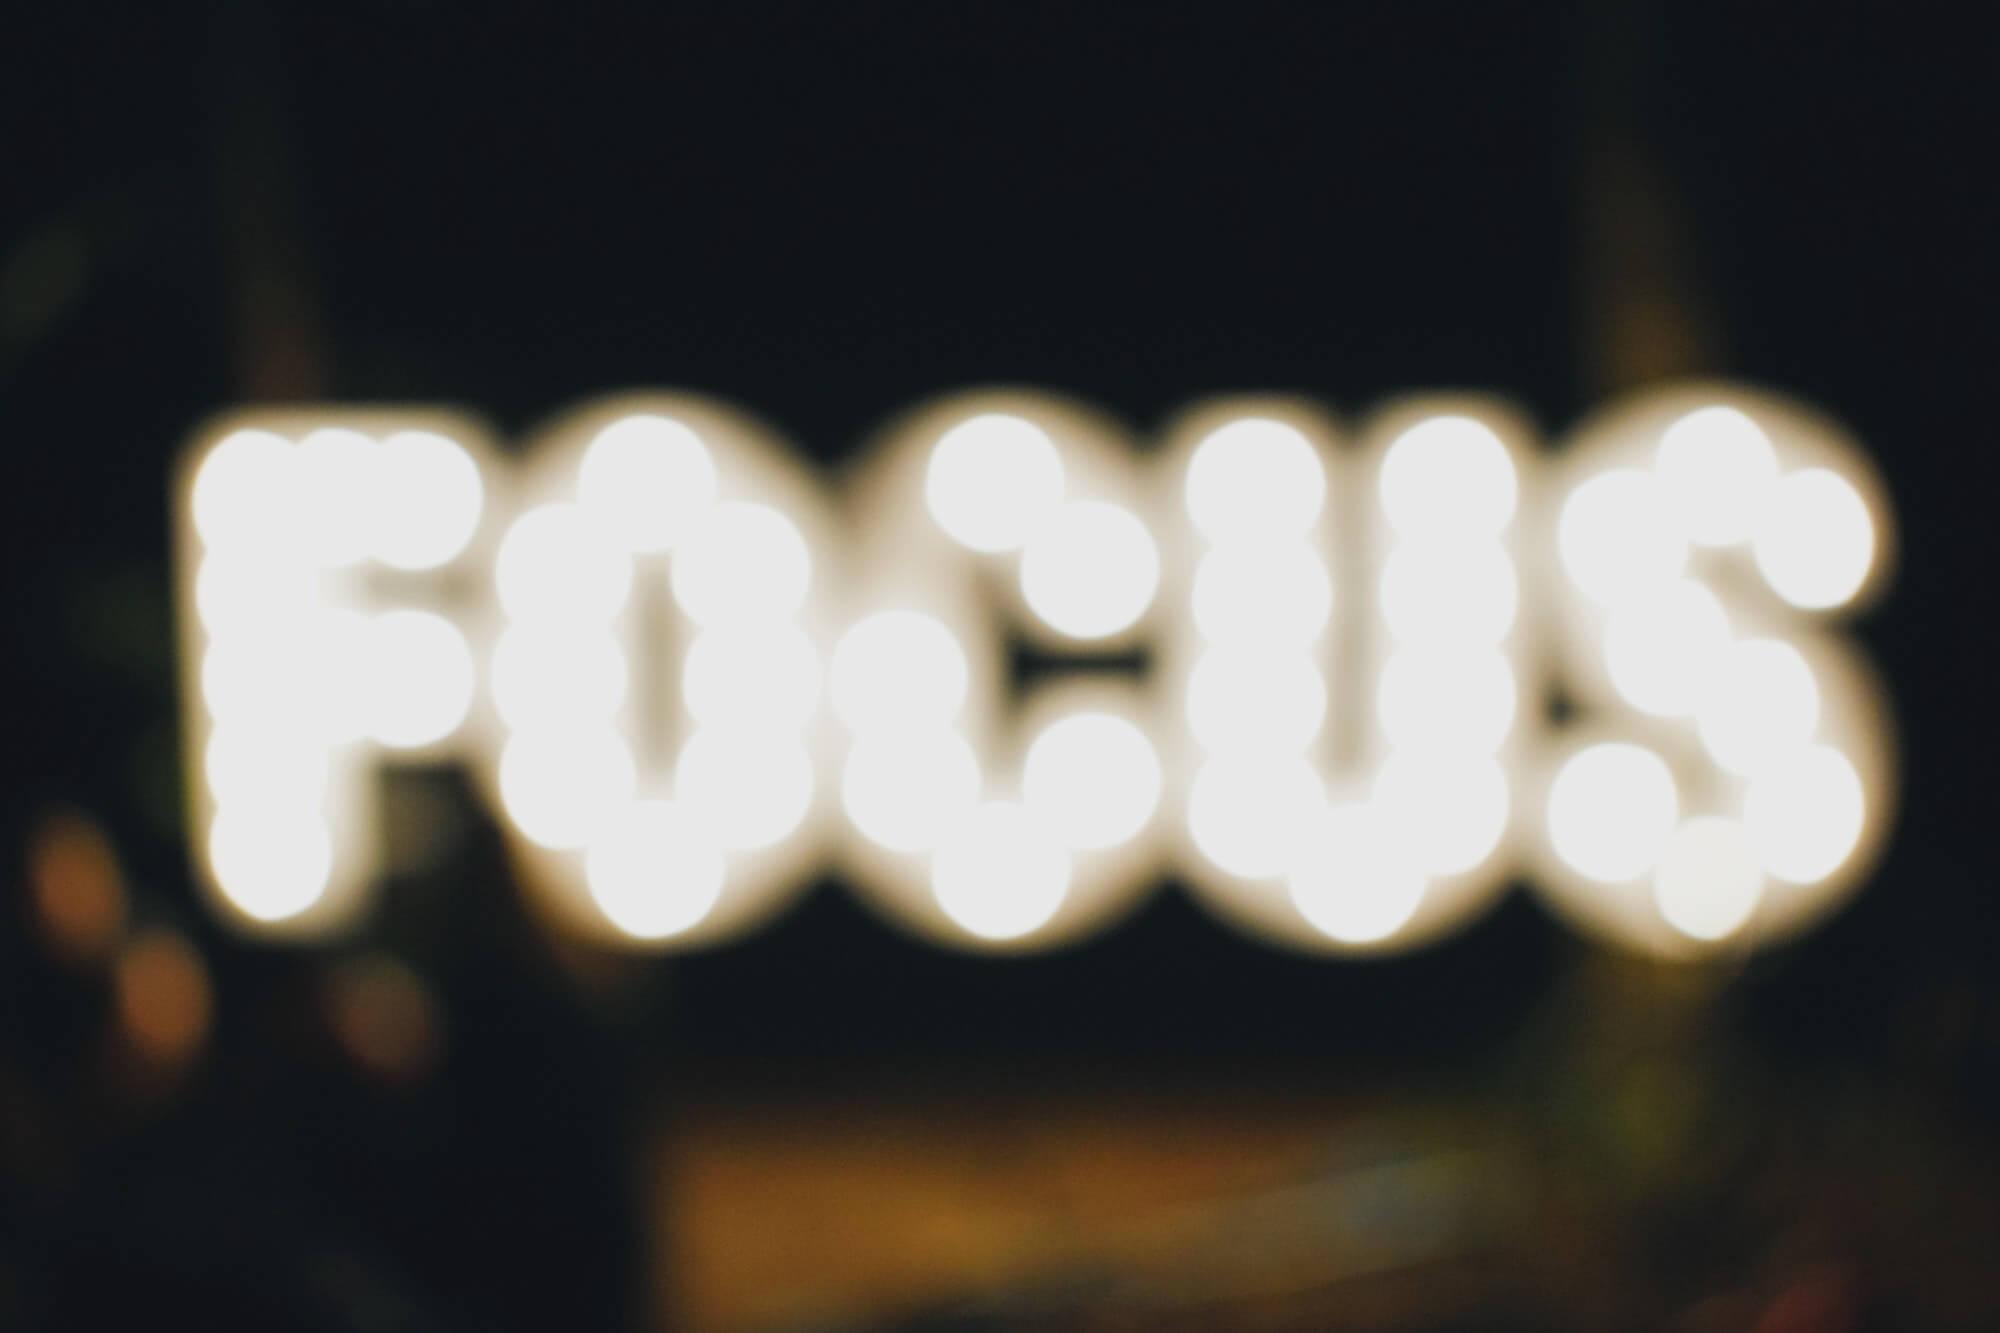 focus skupienie